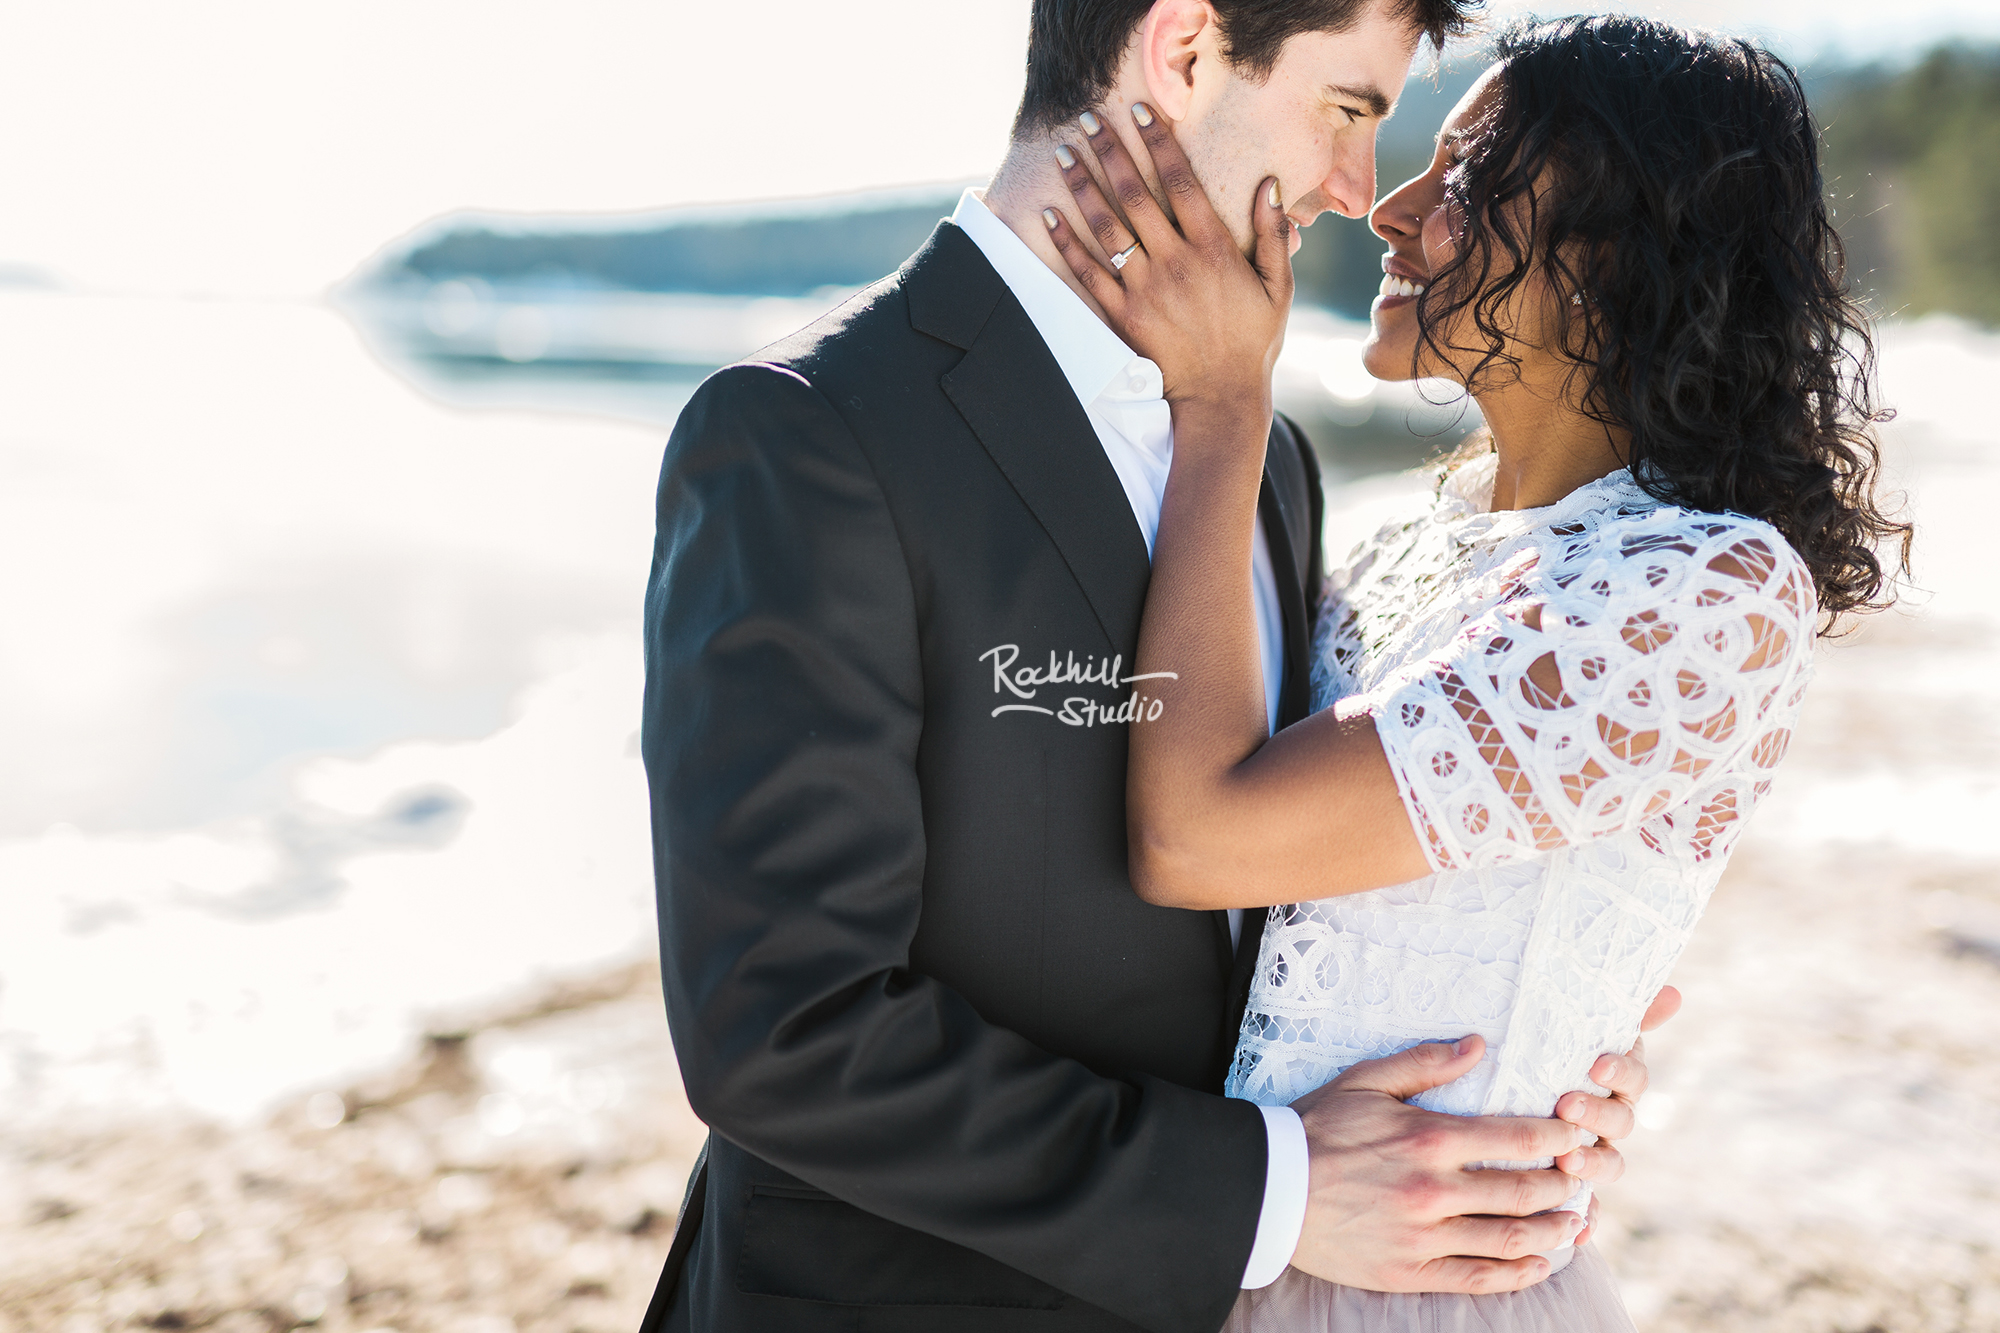 northern-michigan-wedding-marquette-engagement-upper-peninsula-michigan-rockhill-winter-18.jpg